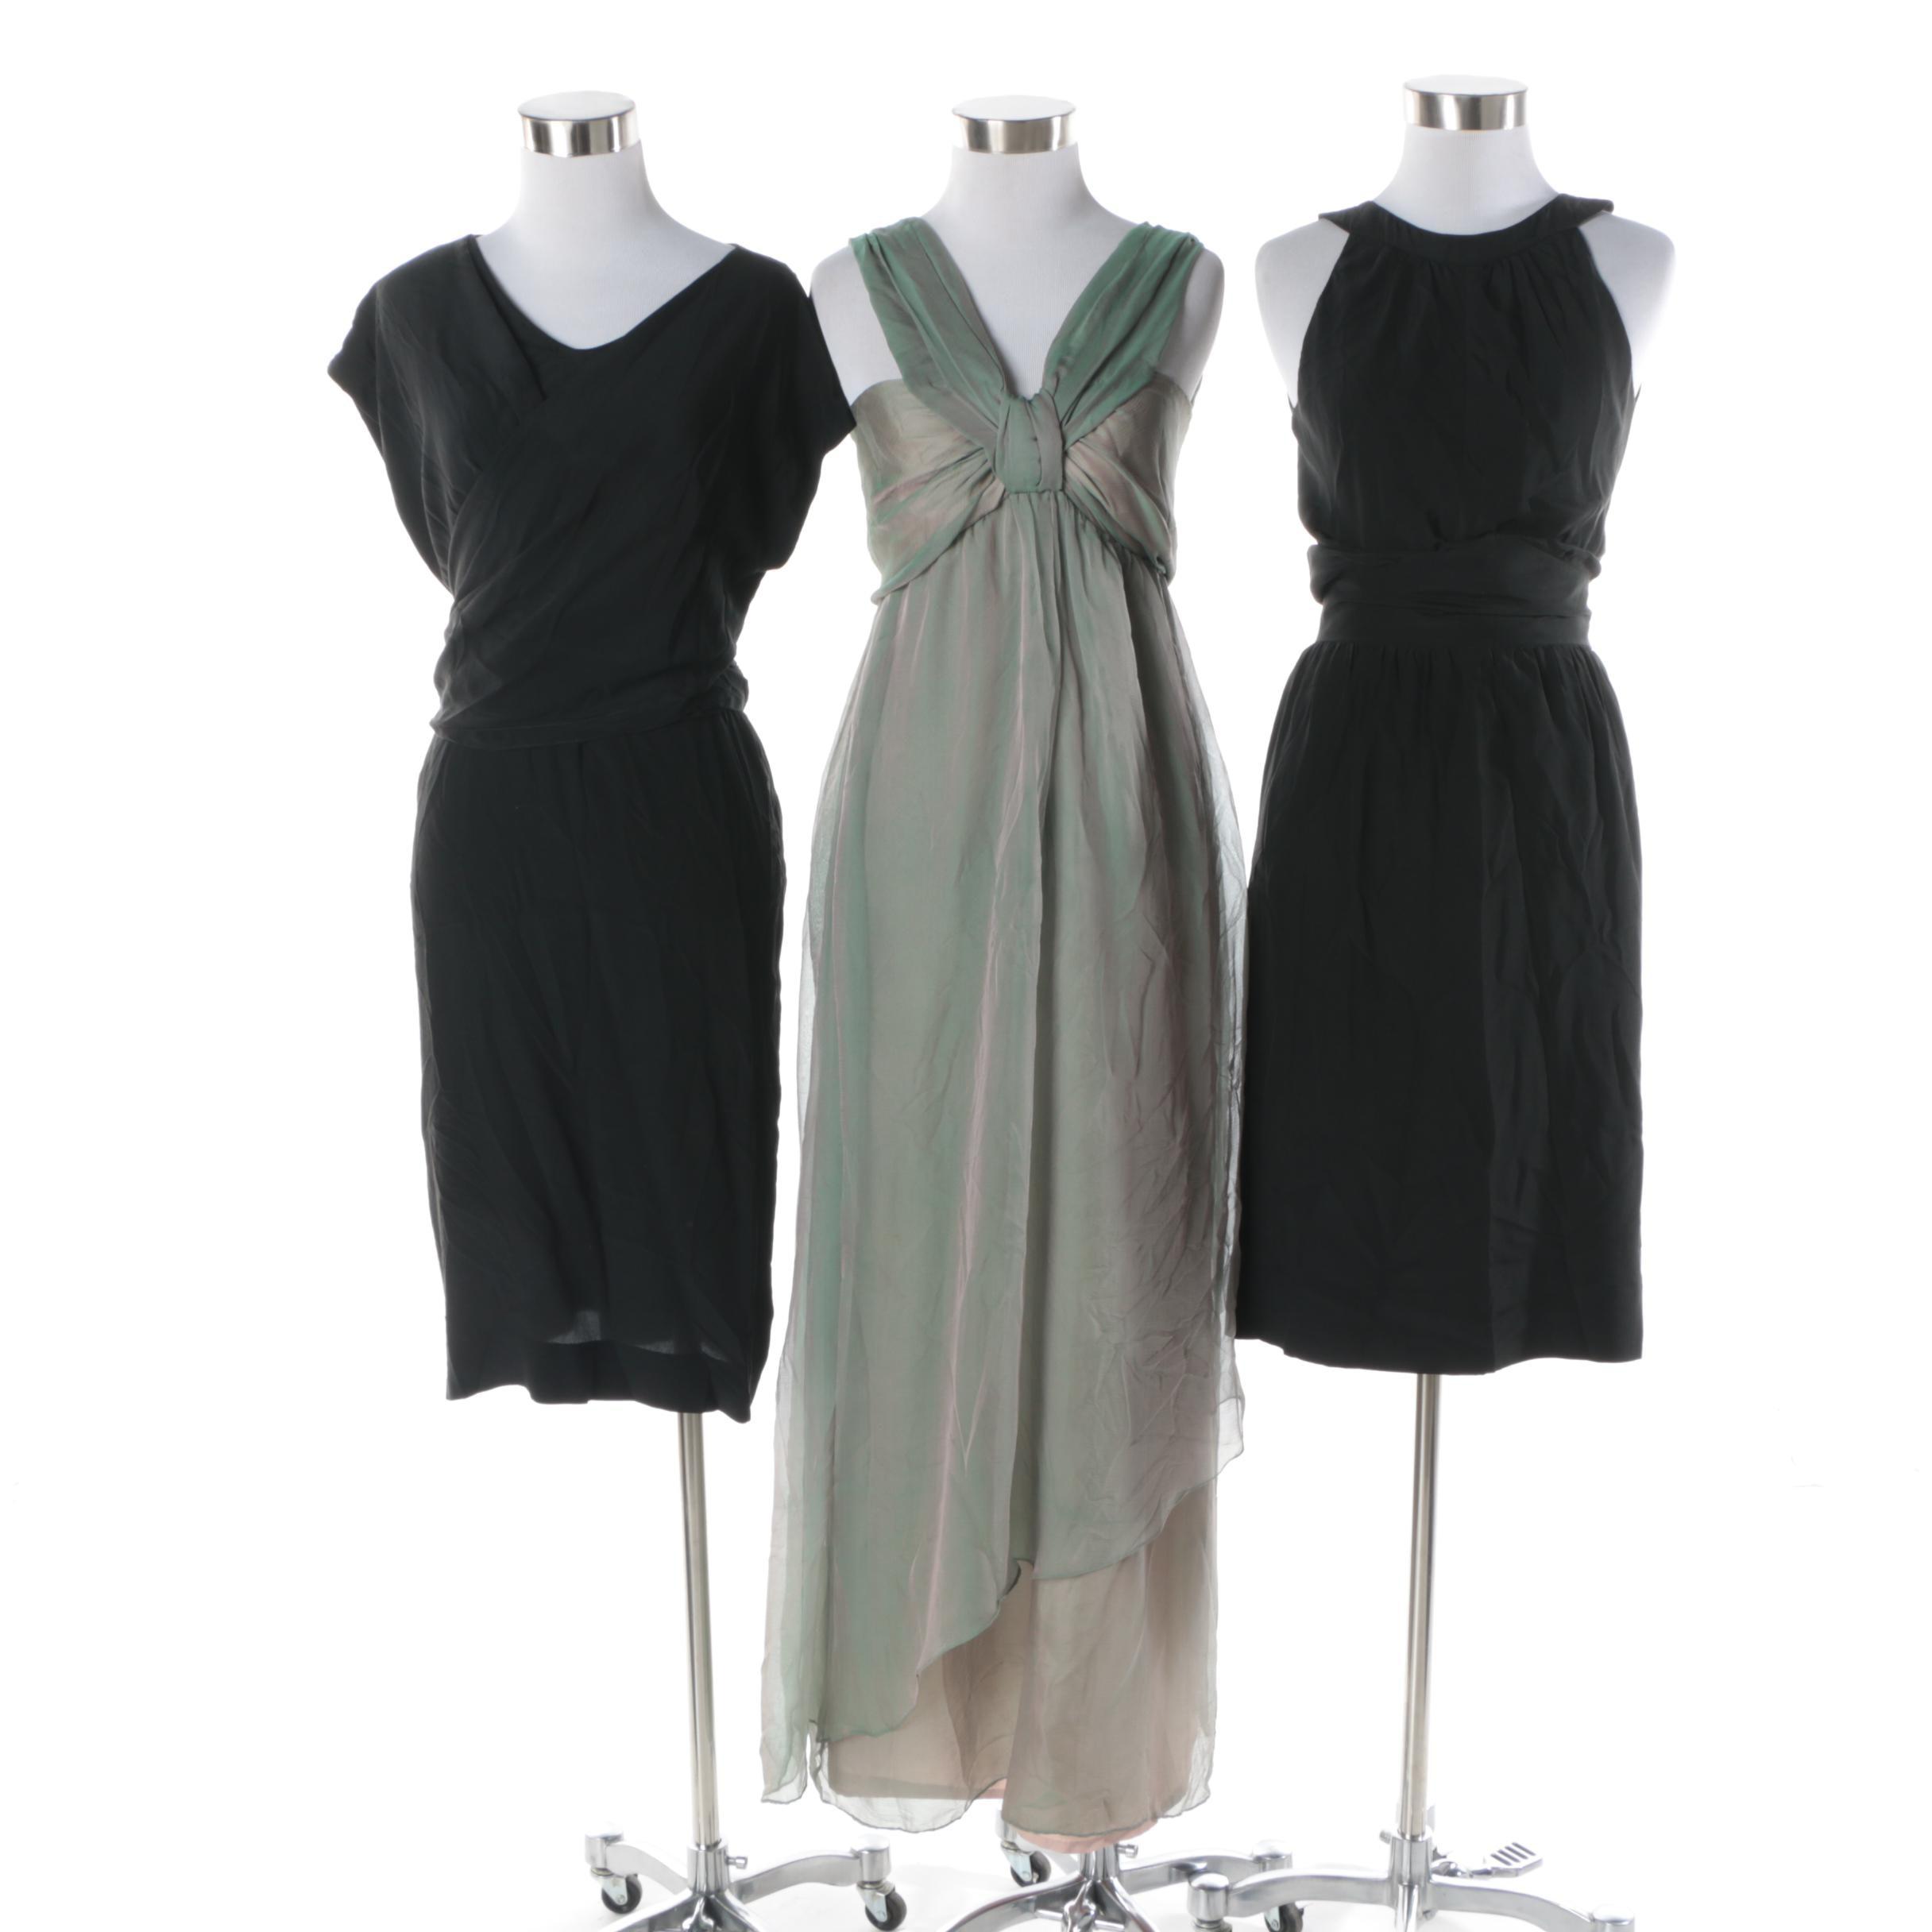 Three Evening Dresses Including Black Cocktail Dresses